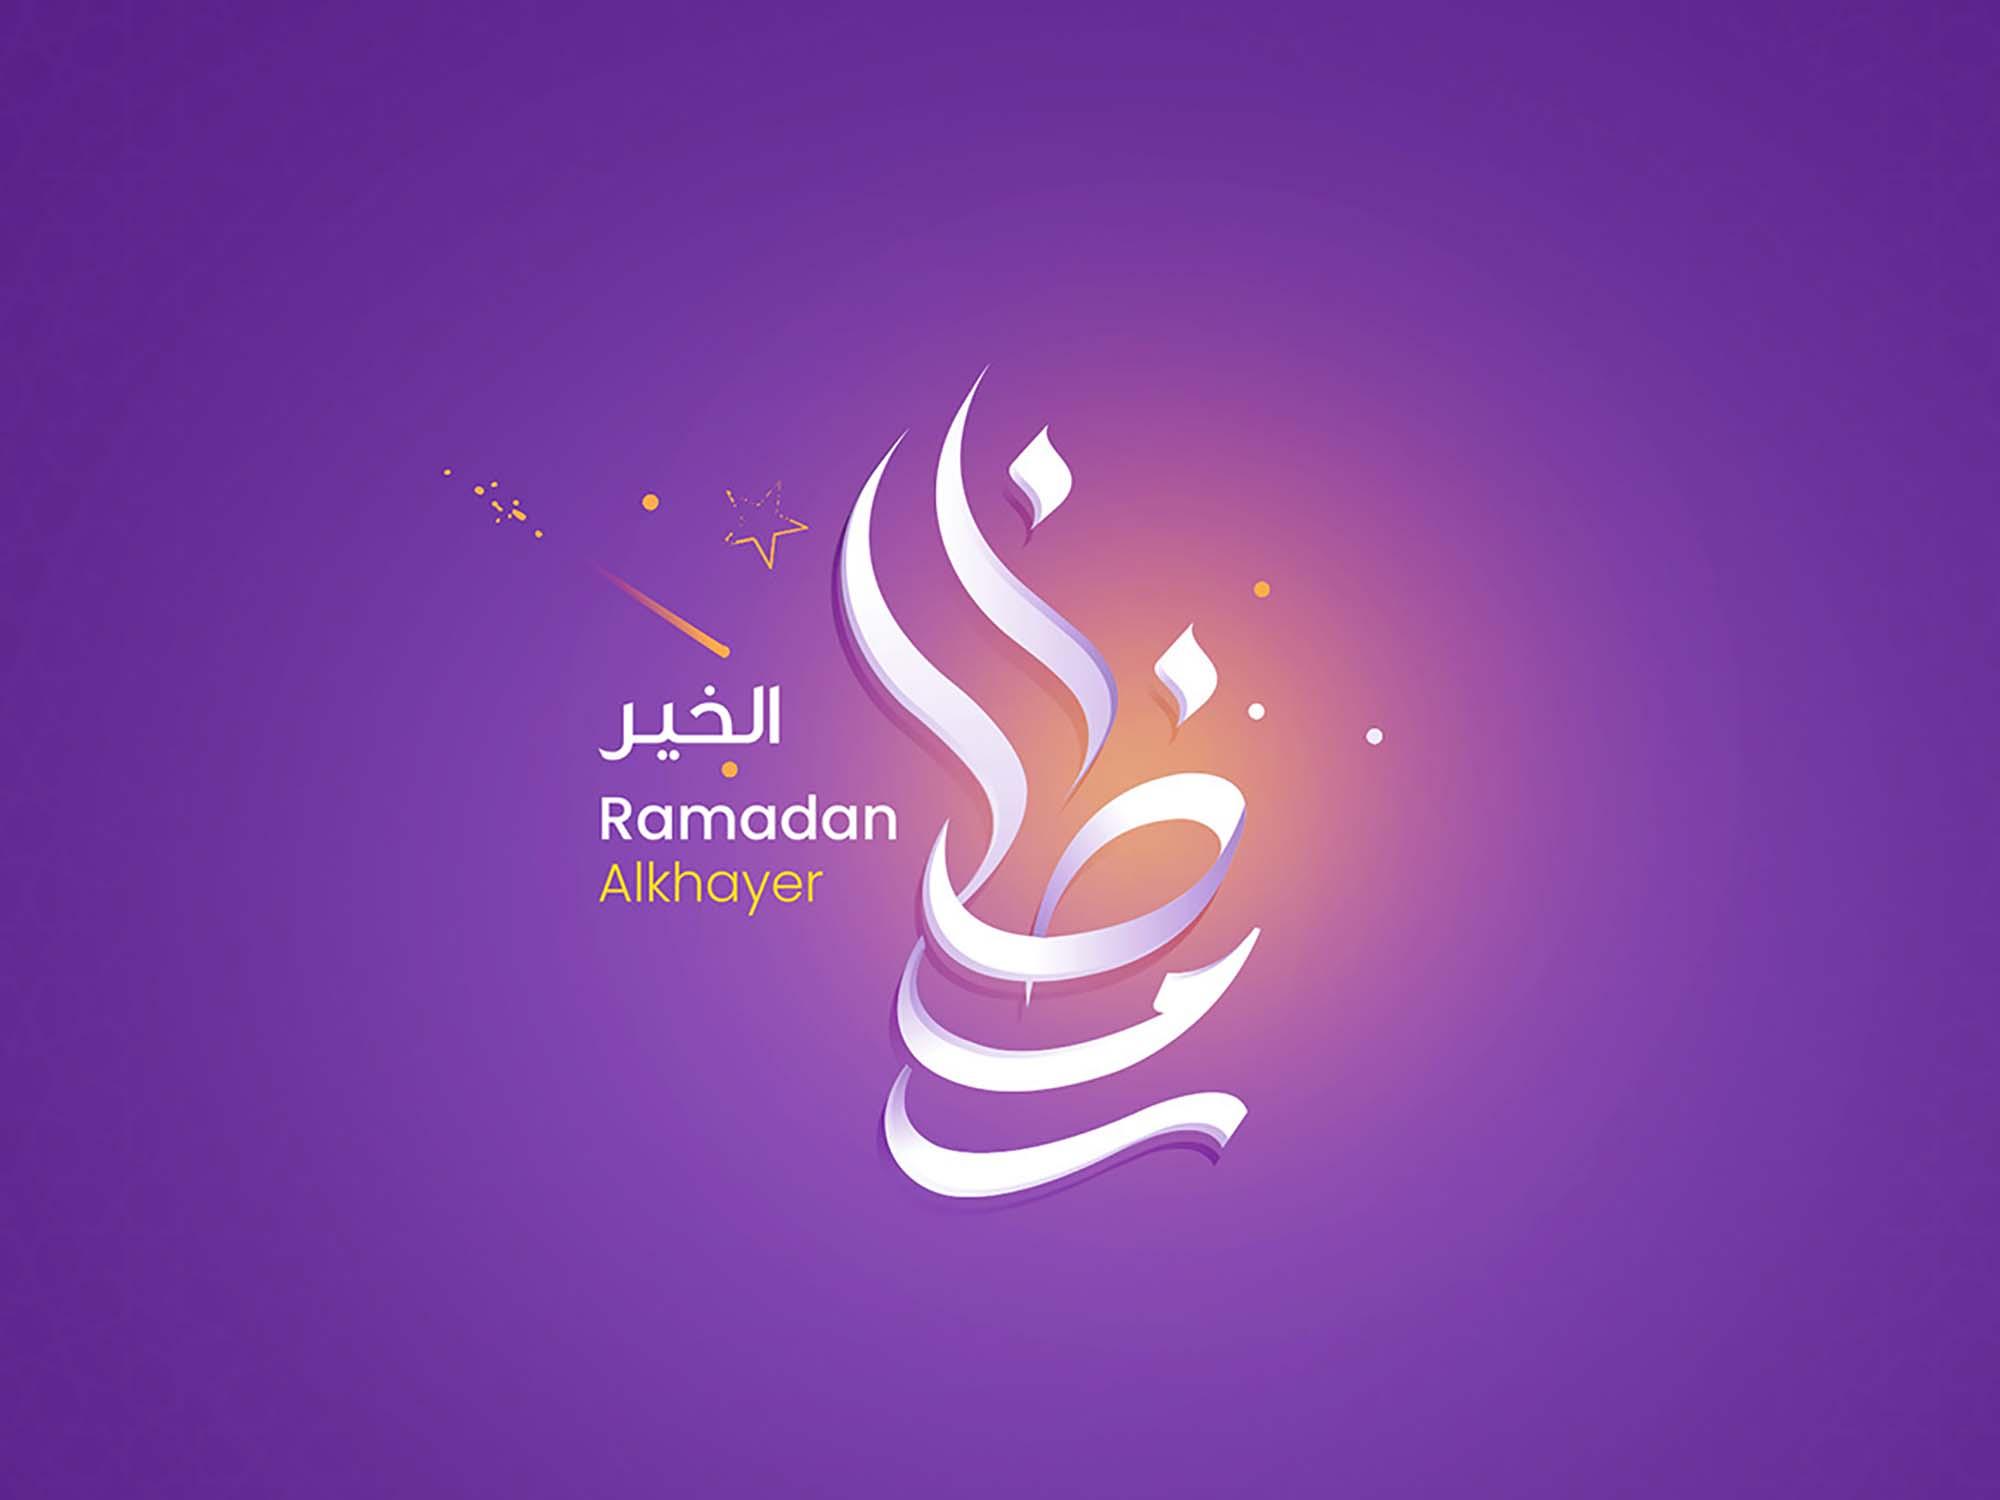 Ramadan Typography Templates